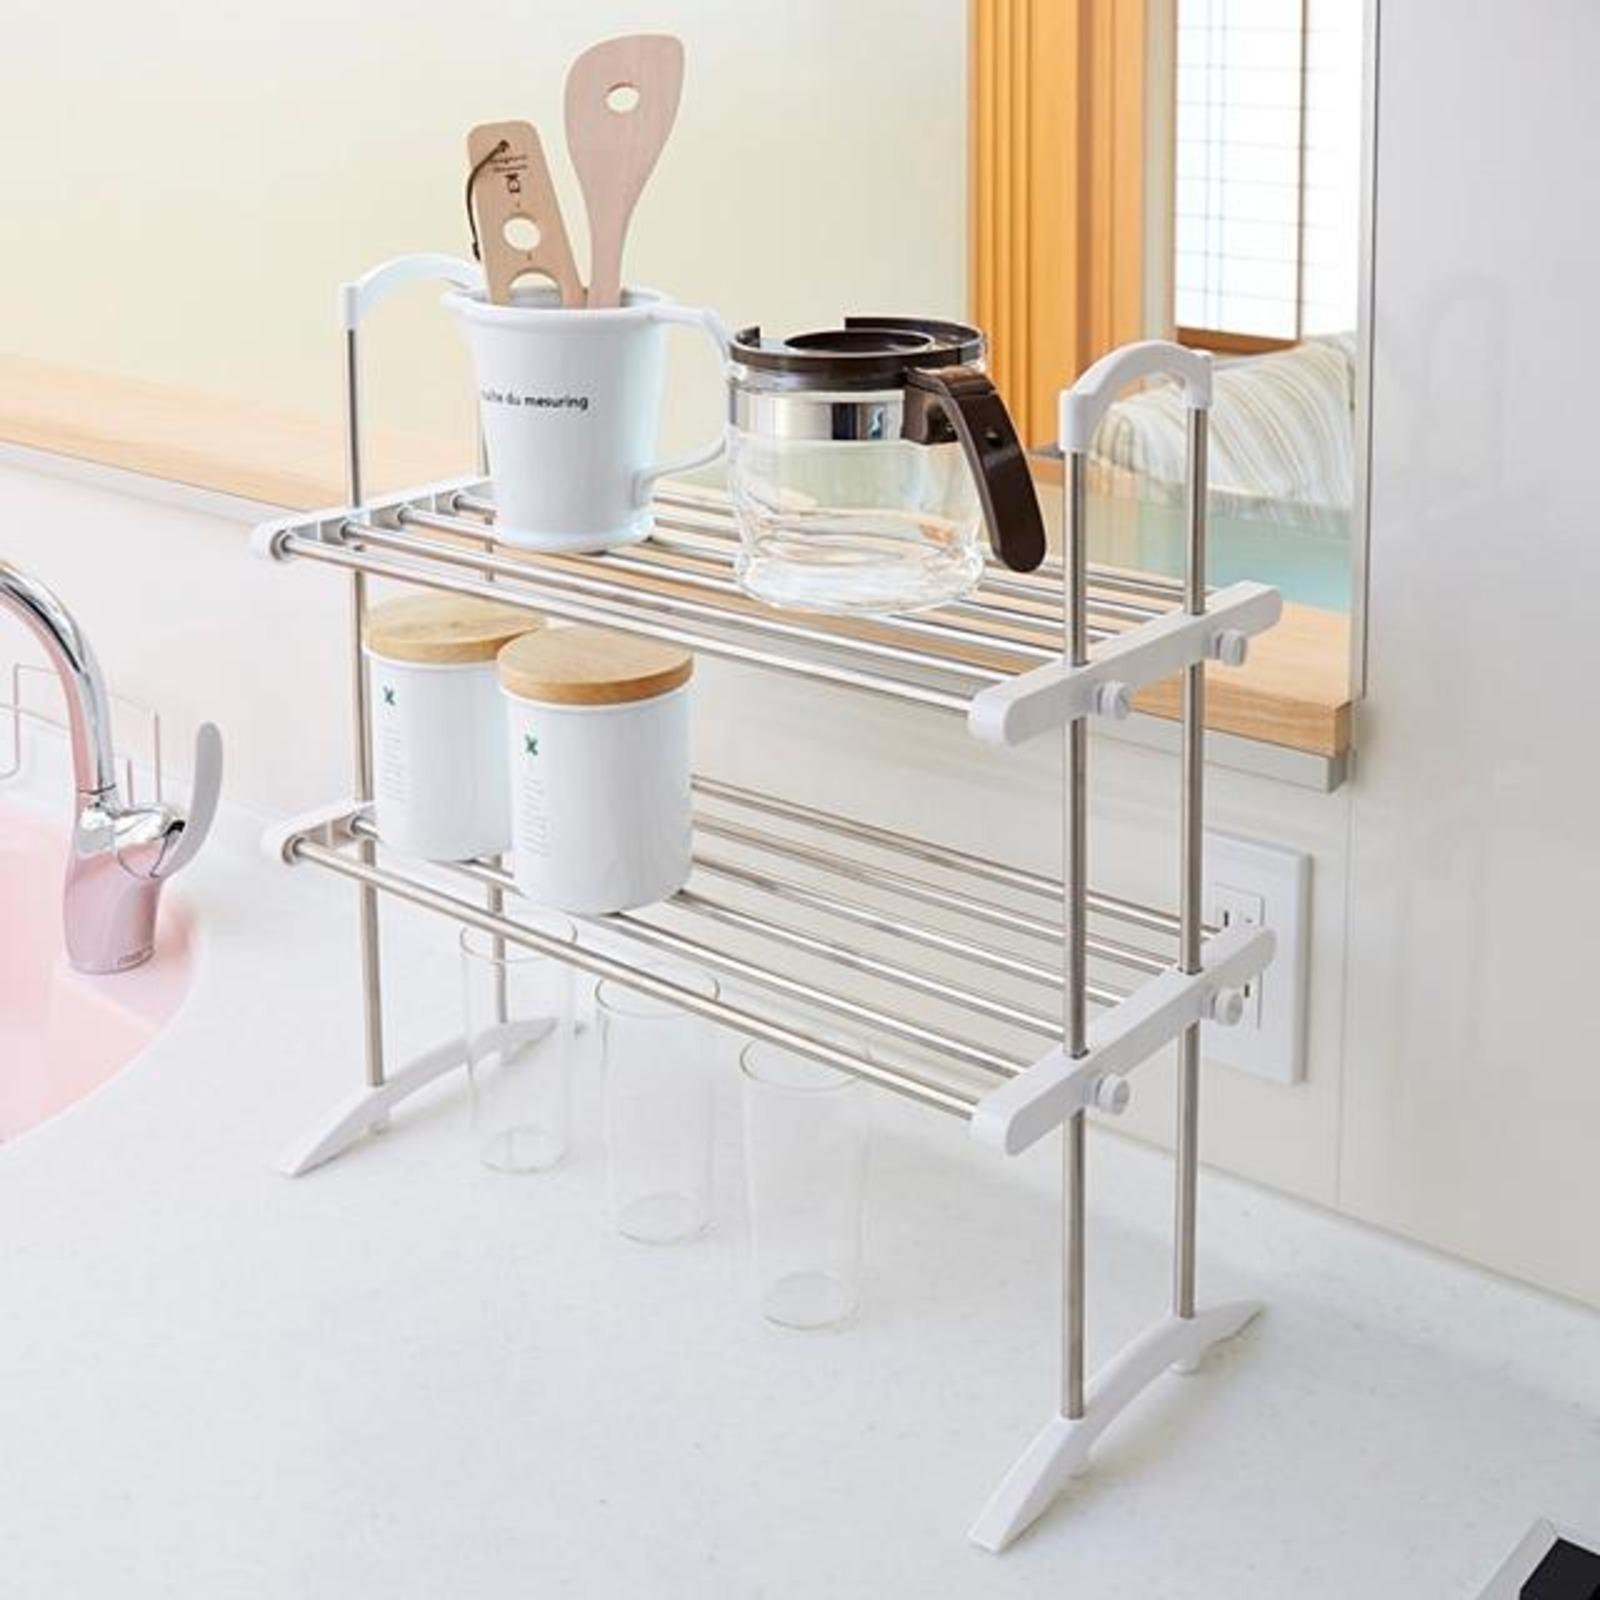 HEIAN SHINDO 2 Tier Kitchen Storage Rack TOS-10 S/S